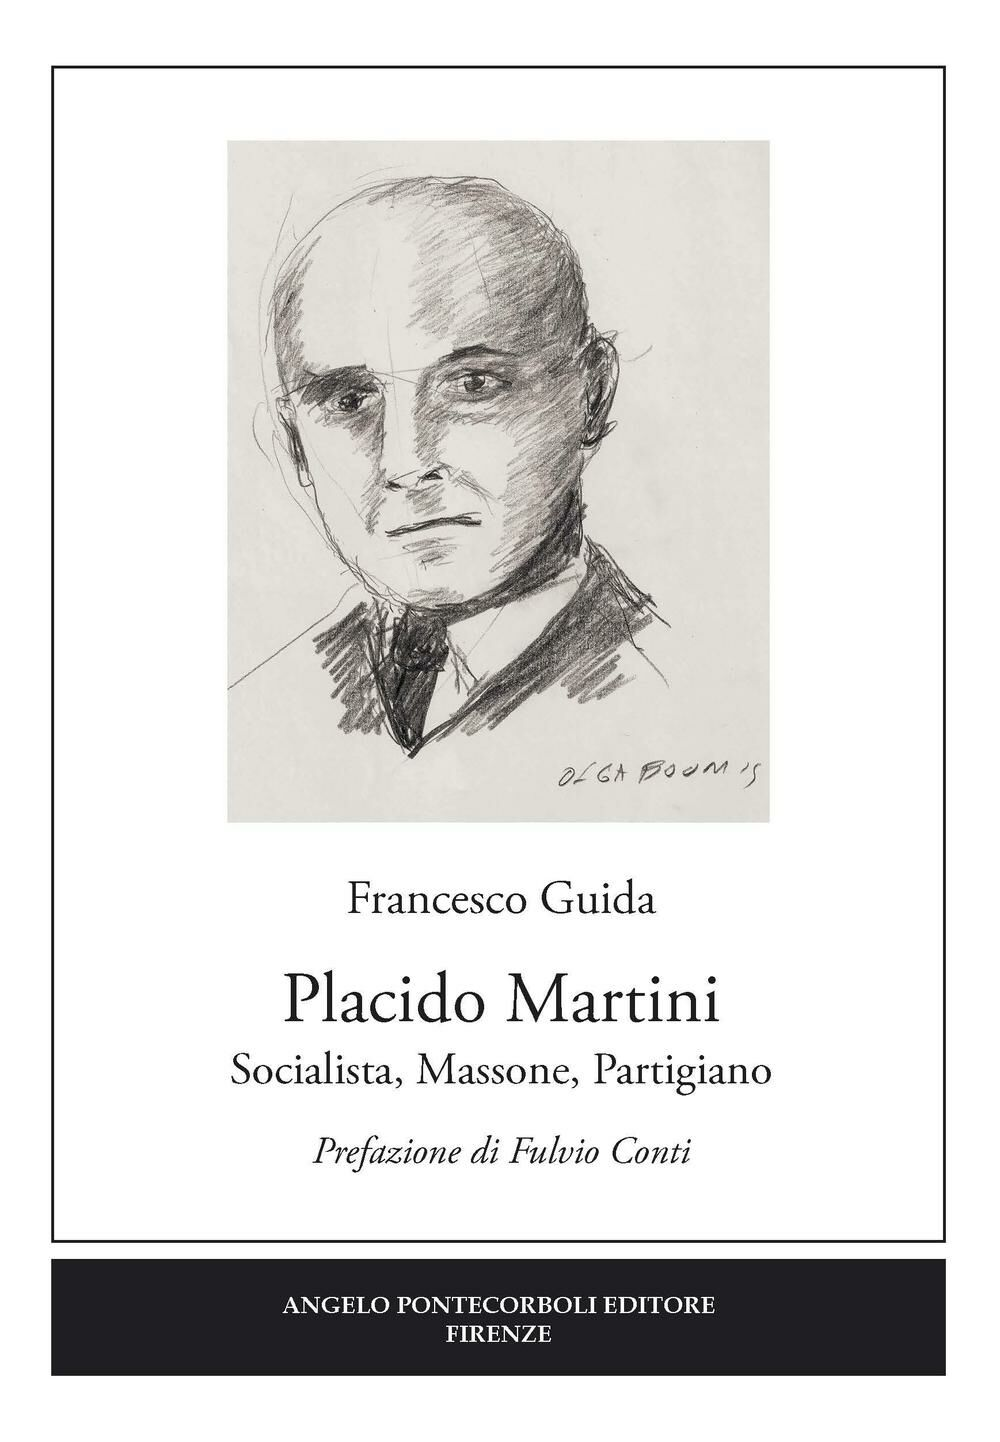 Placido Martini. Socialista, massone, partigiano